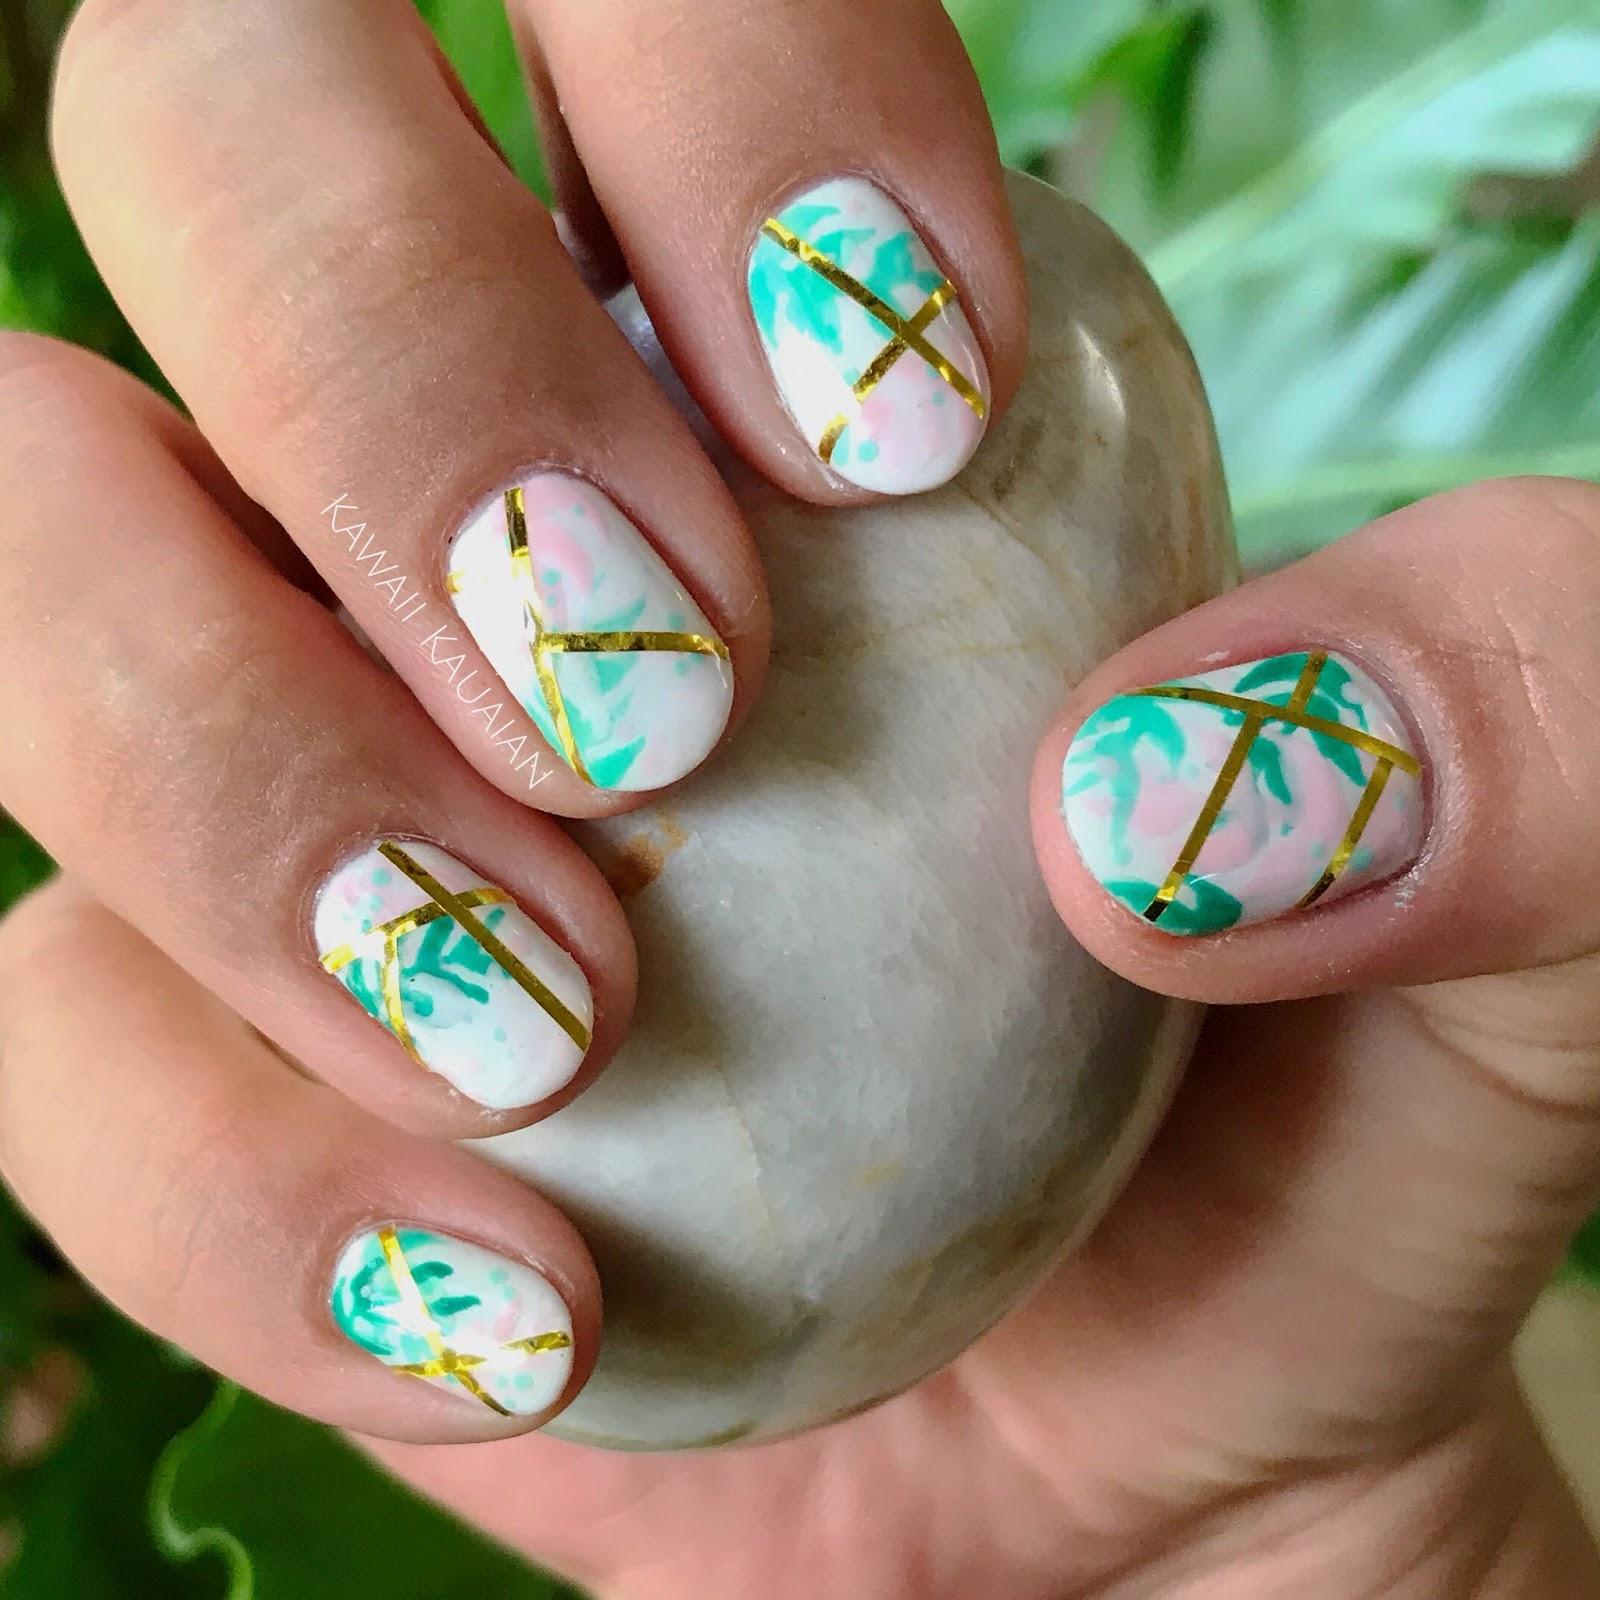 This Week\'s Nails: The Golden Girl\'s Pastel and Glitz - Kawaii Kauaian